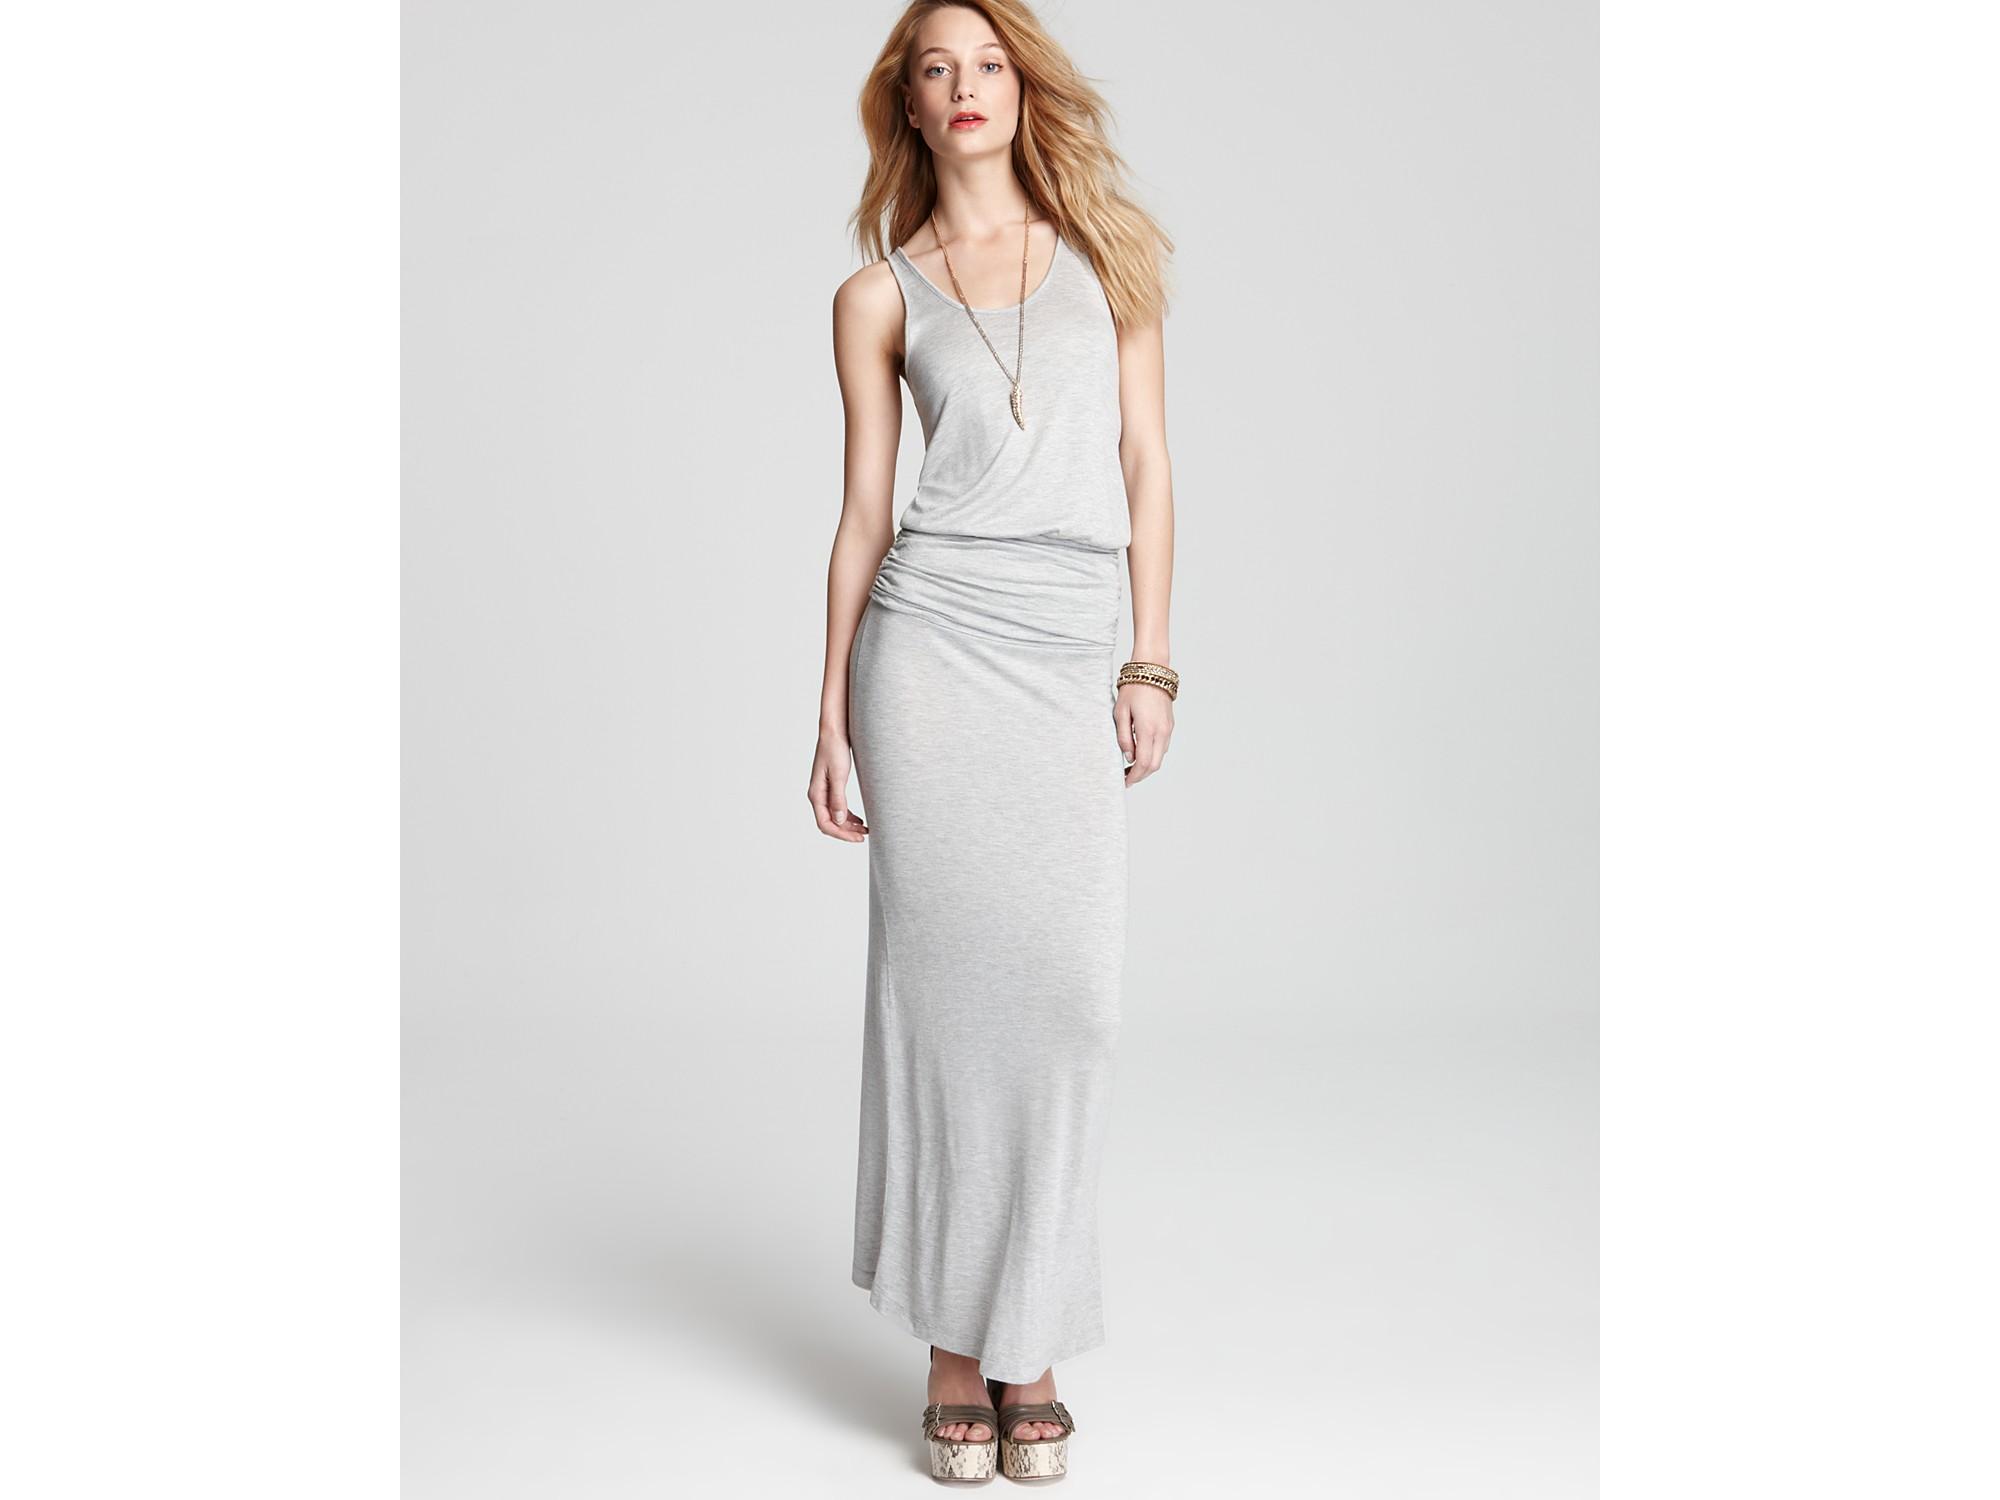 Joie Soft Maxi Dress Wilcox Blouson In Gray Heather Grey